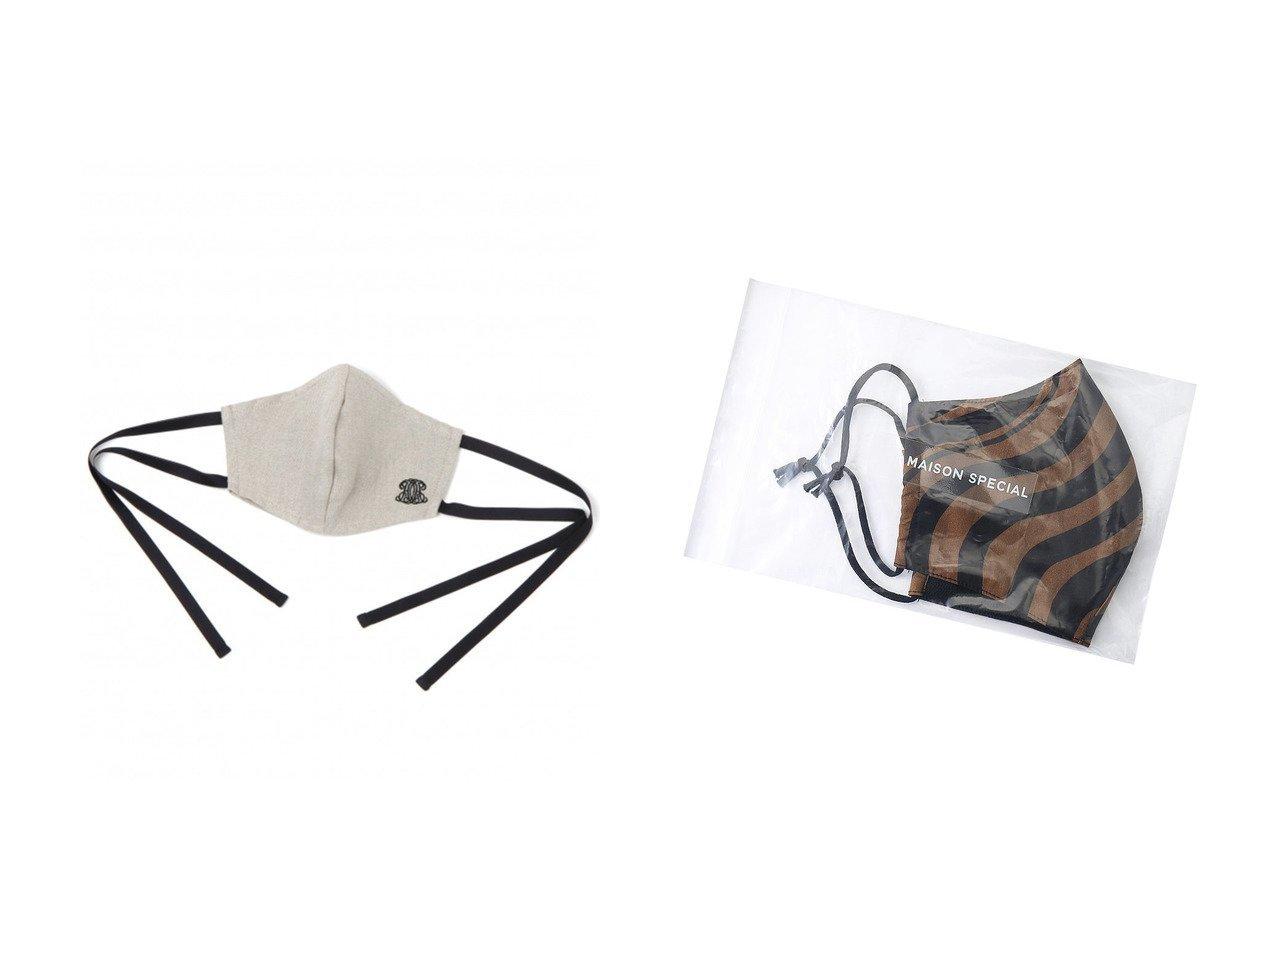 【Chaos/カオス】のリネンストリングマスク&【MAISON SPECIAL/メゾンスペシャル】のウェーブプリントマスク おすすめ!人気、トレンド・レディースファッションの通販 おすすめで人気の流行・トレンド、ファッションの通販商品 インテリア・家具・メンズファッション・キッズファッション・レディースファッション・服の通販 founy(ファニー) https://founy.com/ ファッション Fashion レディースファッション WOMEN キャミソール タンク フィット リネン 吸水 |ID:crp329100000045495